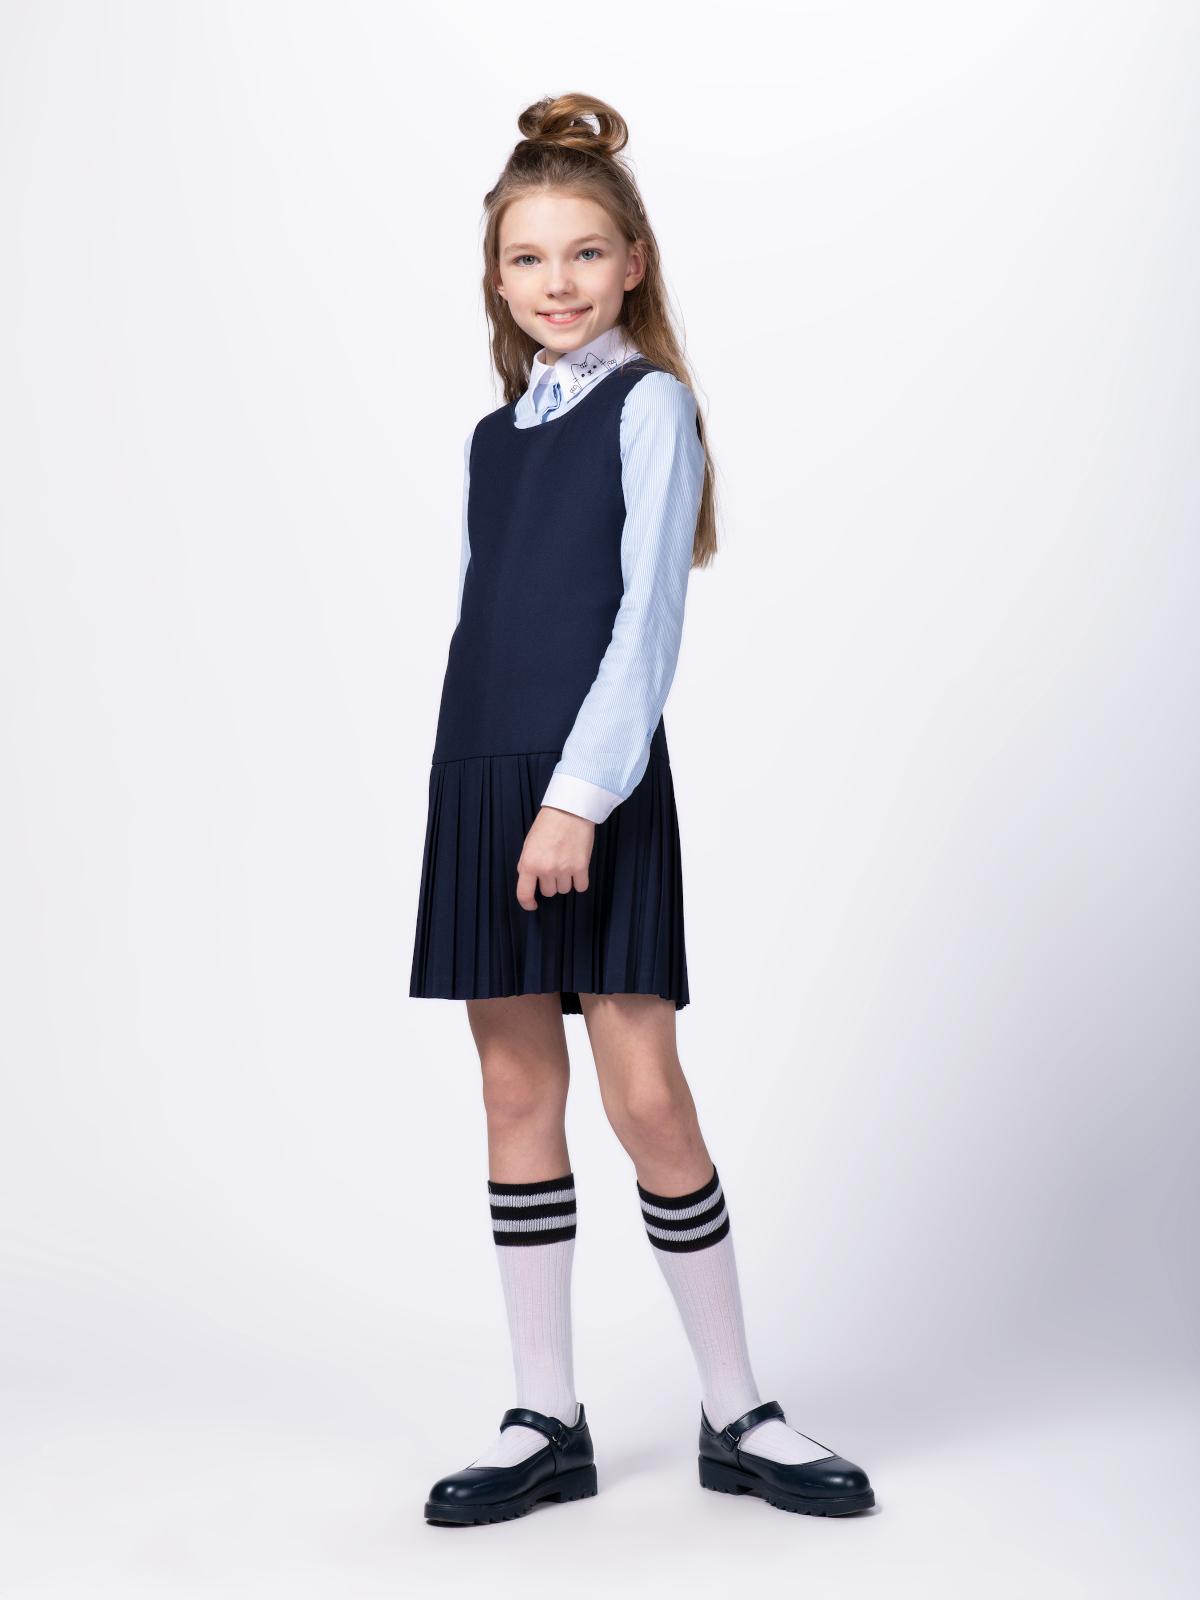 Купить 10606_plus size, Сарафан для девочек СМЕНА цв.синий 10606 р.134/68, Смена, Сарафаны для девочек